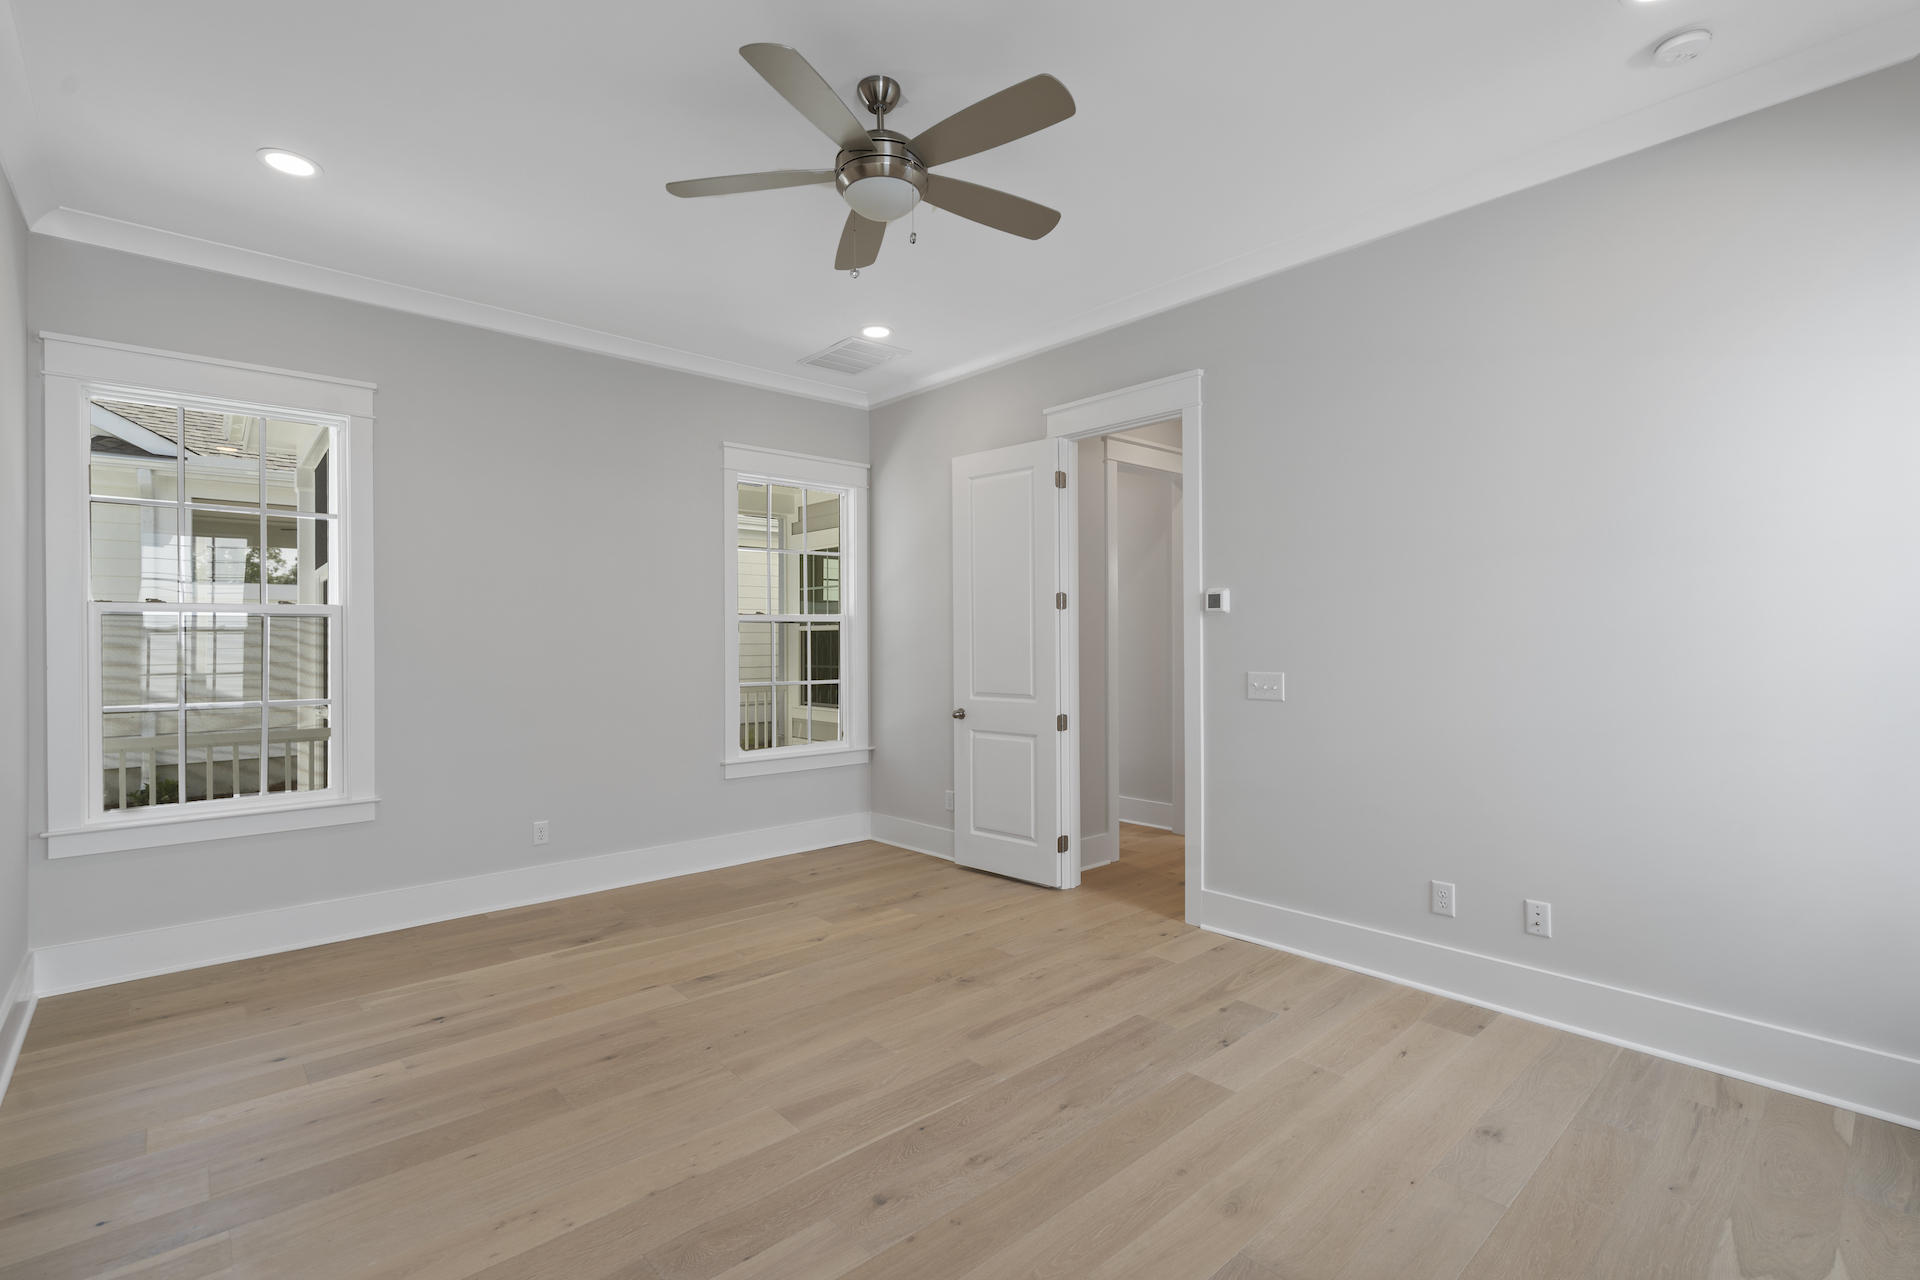 Midtown Homes For Sale - 1328 Upper Union, Mount Pleasant, SC - 18